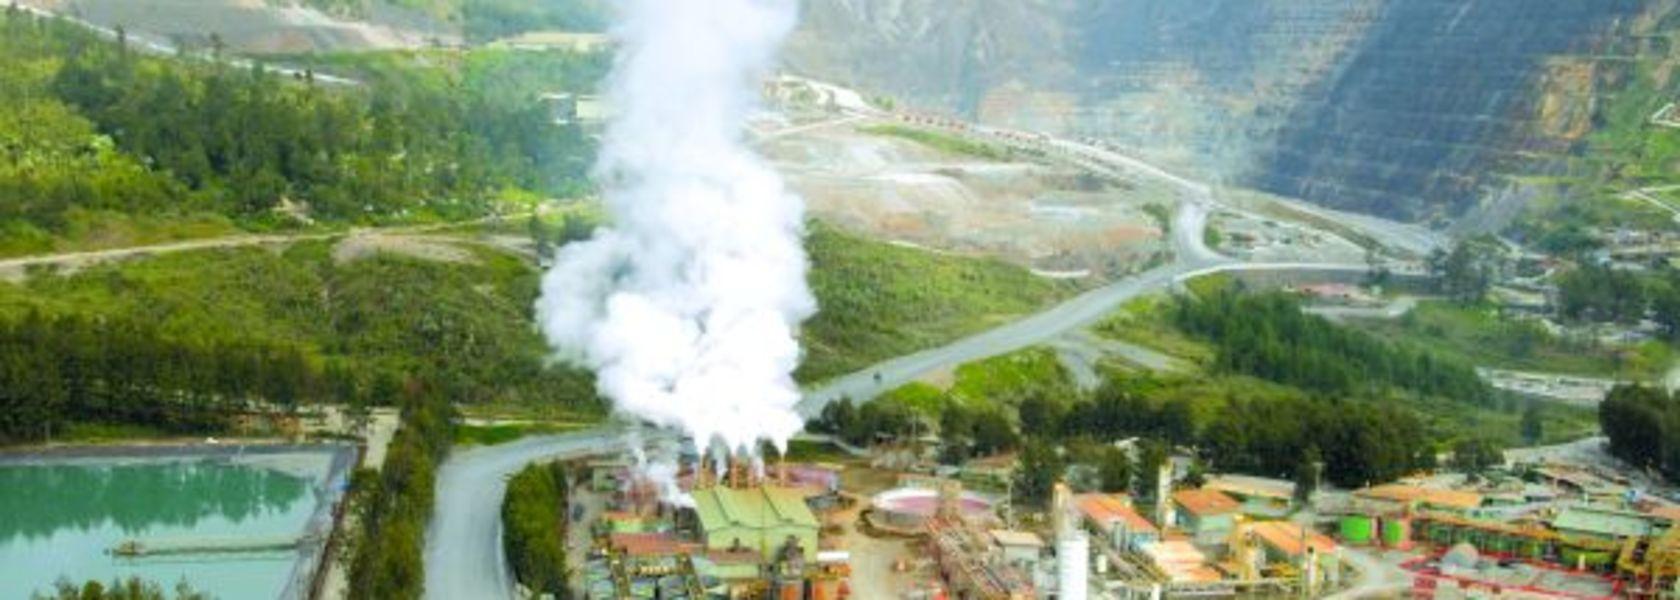 Mining resumes at Porgera.